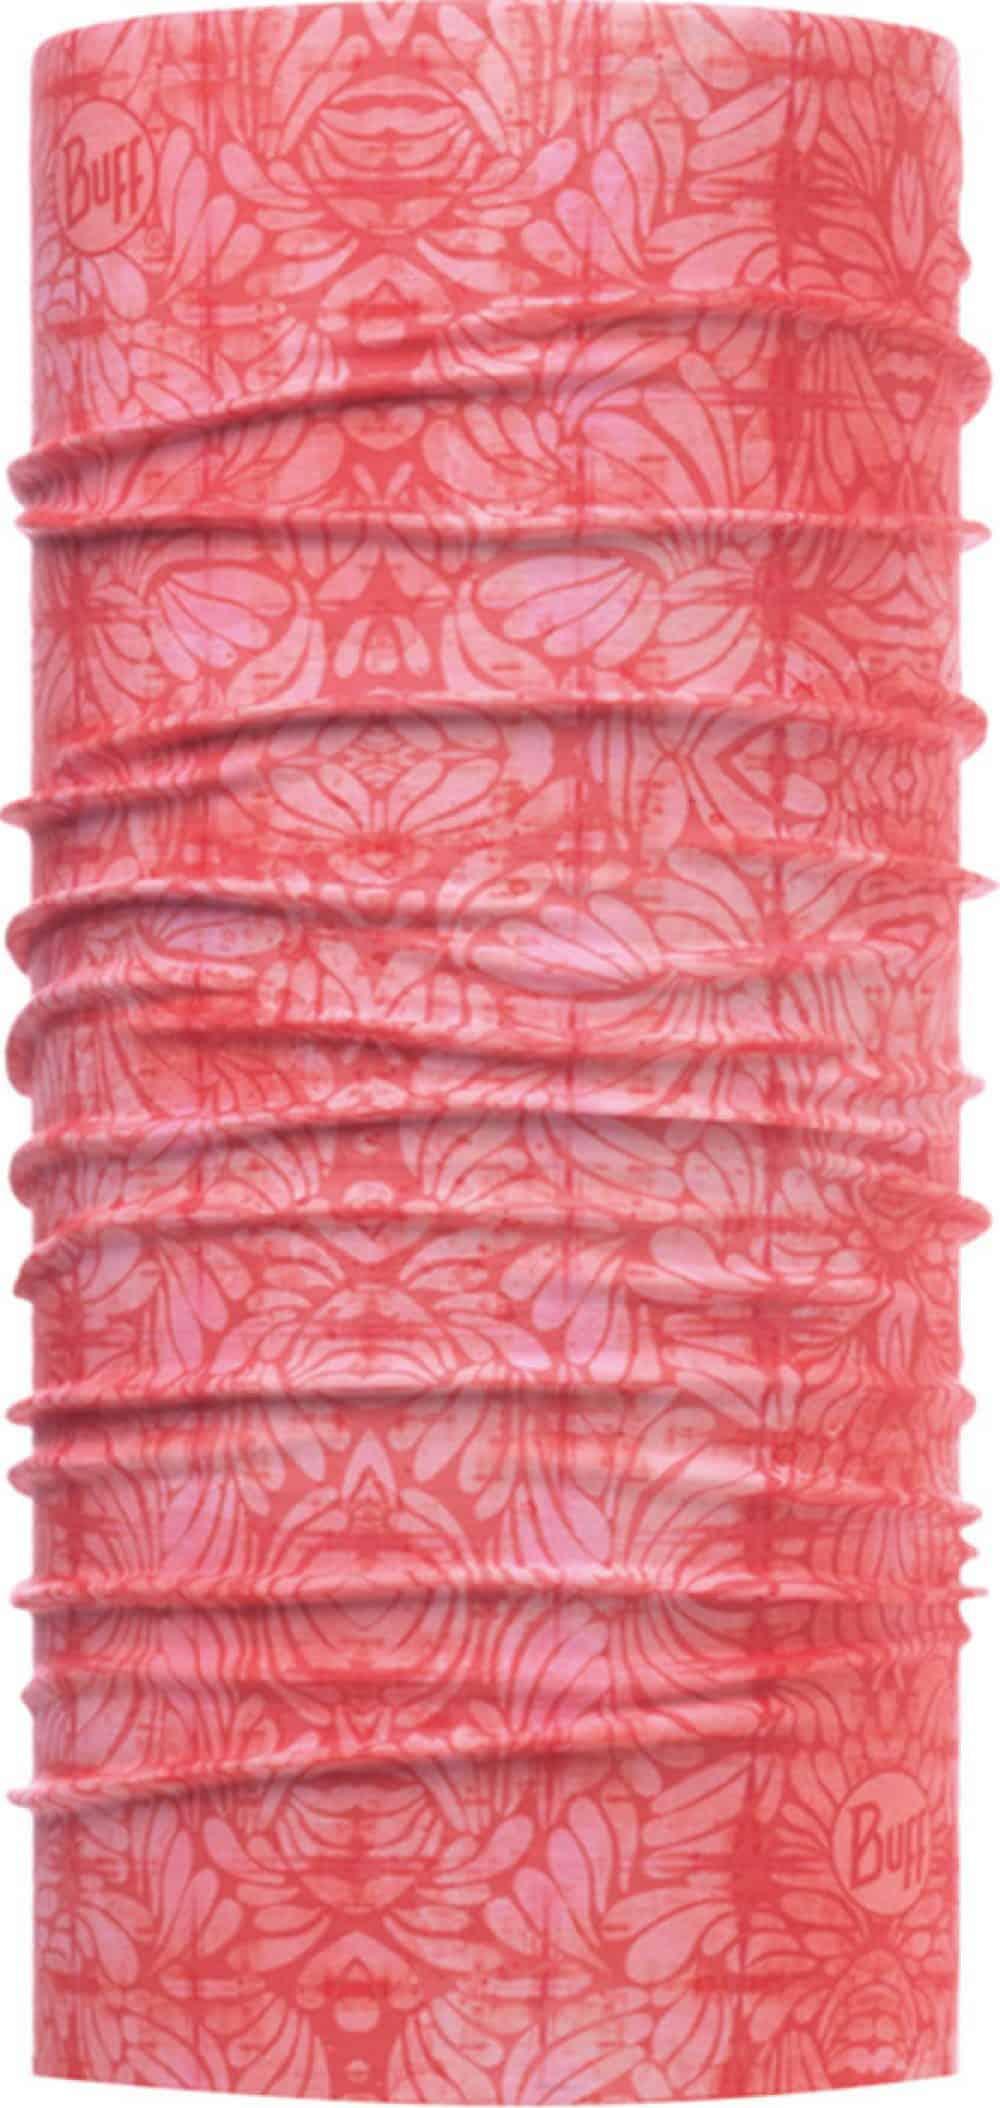 "A product photo of the High UV Buff® ""Salmon Rose"". Source: buff.eu"